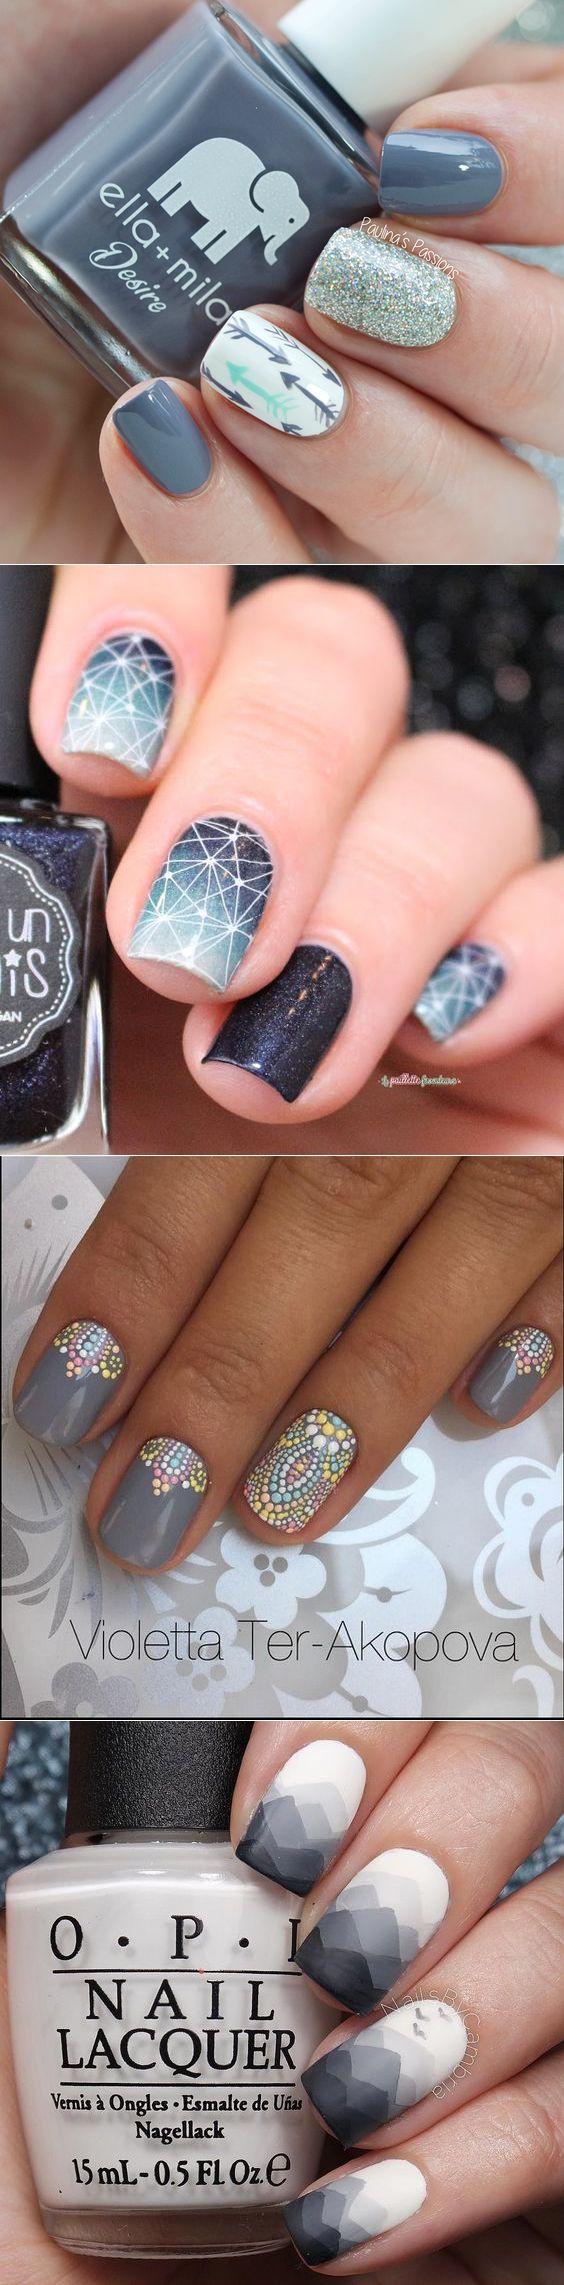 1266 best DEcOraCioN UñaS images on Pinterest | Nail art, Nail ...